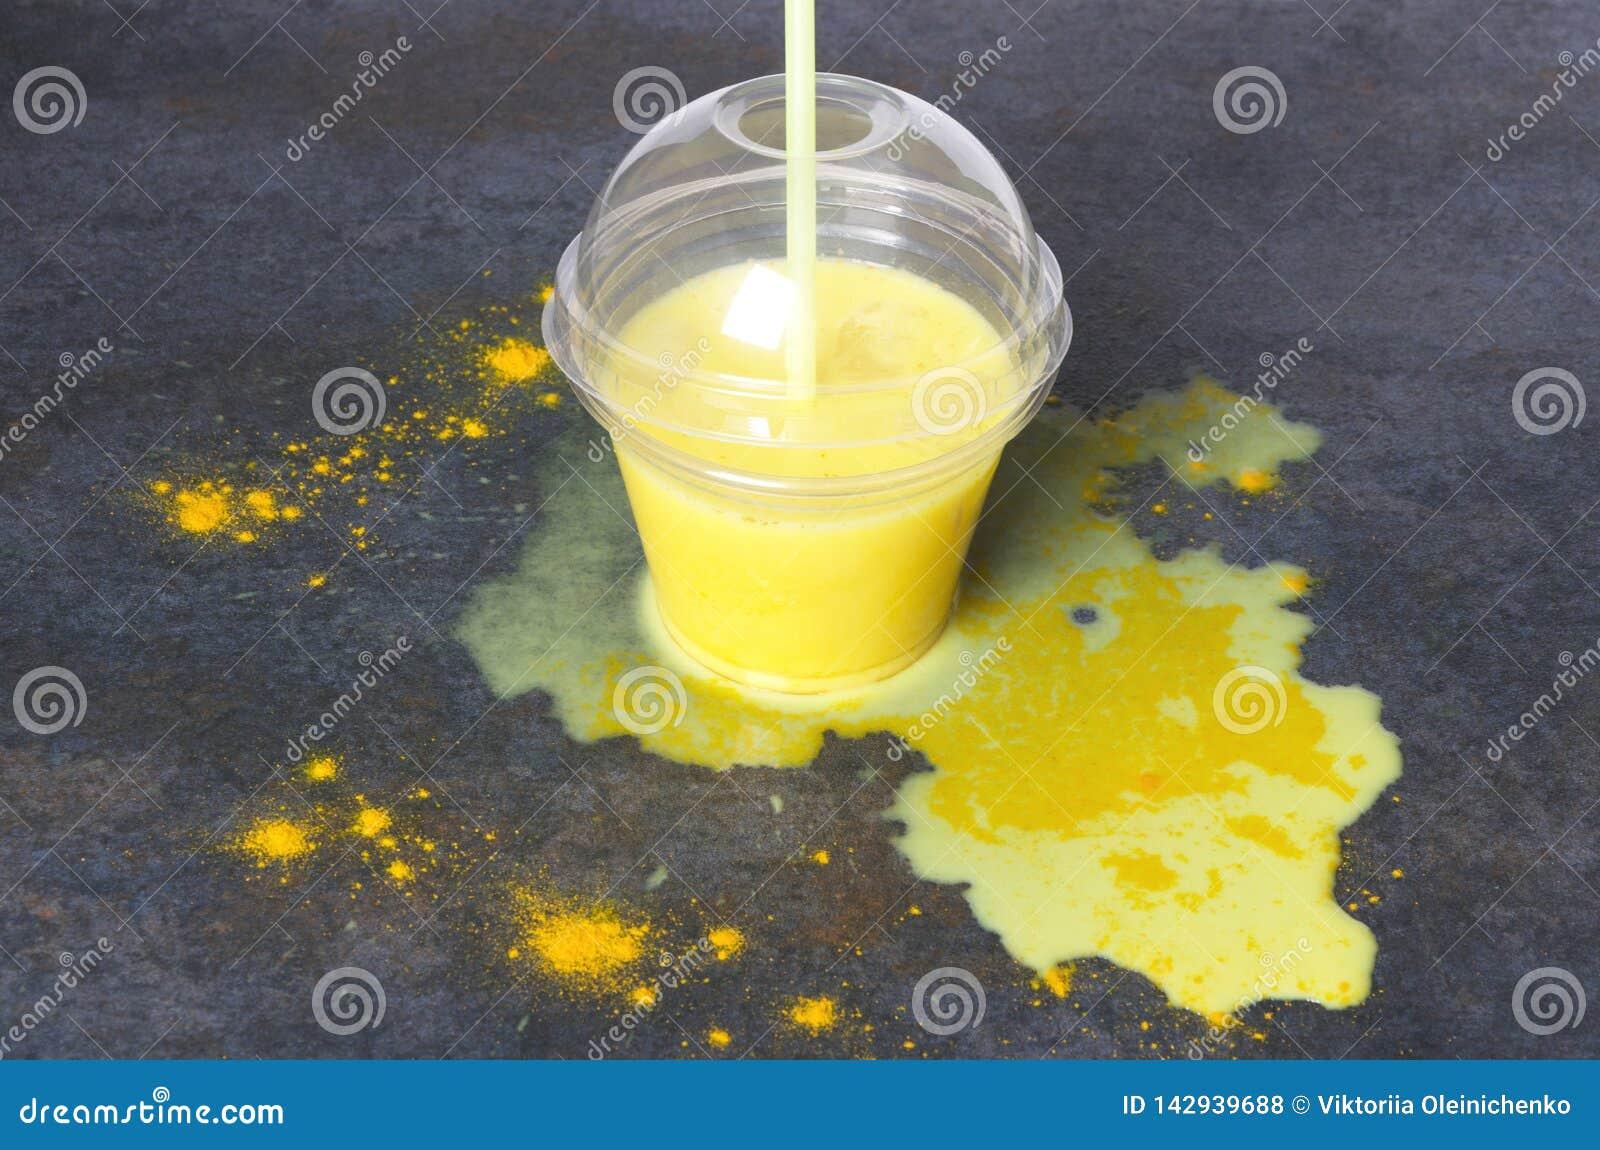 Turmeric latte στο σκοτεινό πίνακα Χυμένο χρυσό γάλα στον πίνακα κουζινών Φλυτζάνι του χρυσού γάλακτος